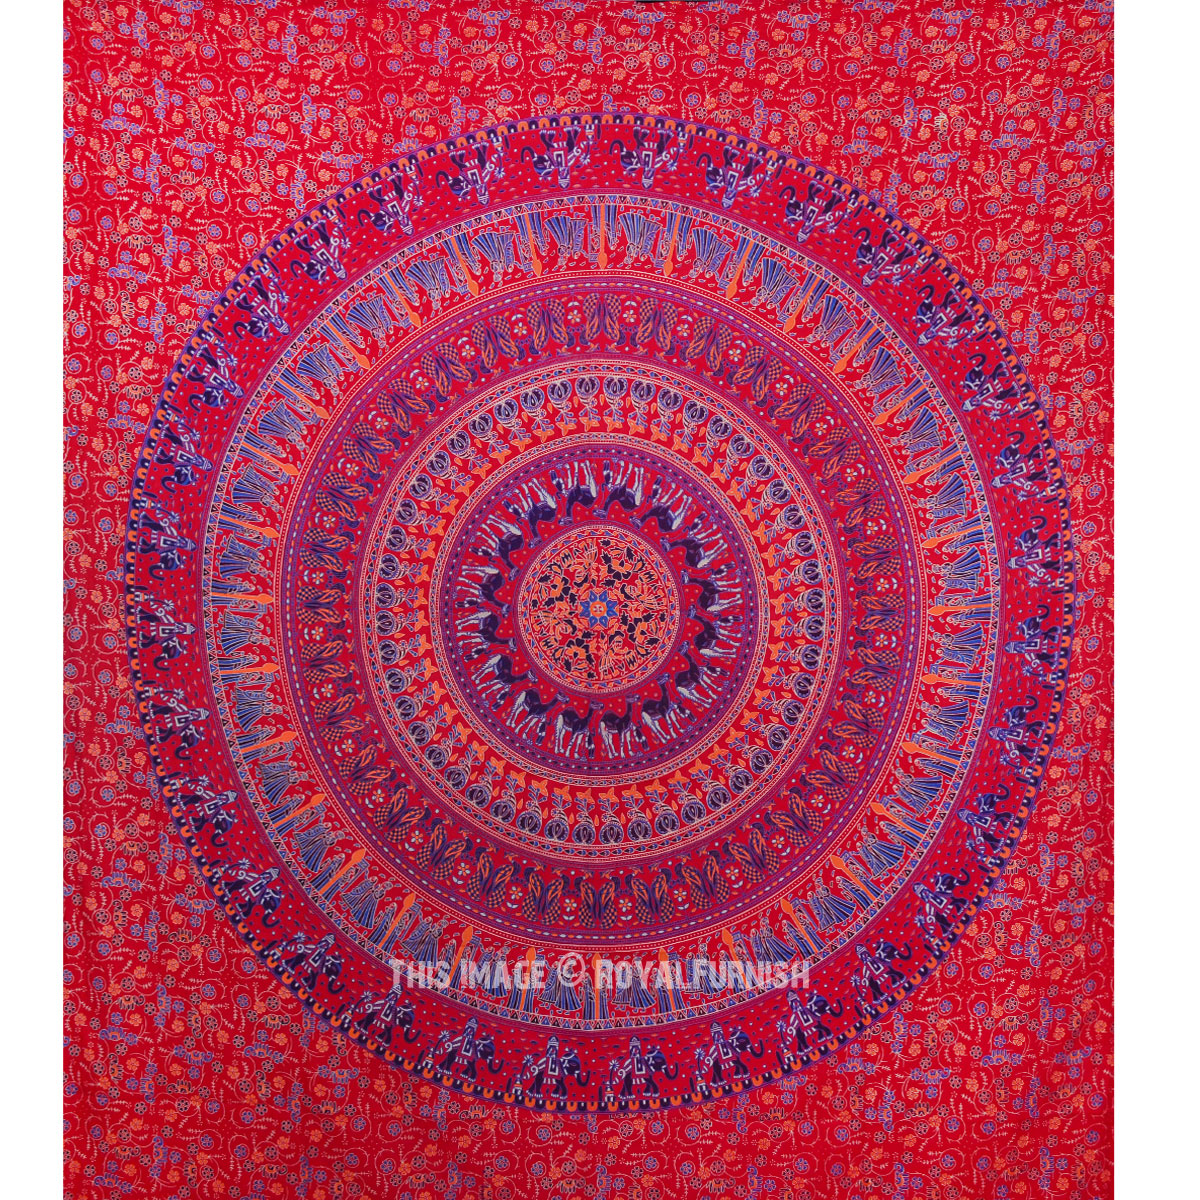 Vibrant Red Bohemian Culture Circle Mandala Tapestry